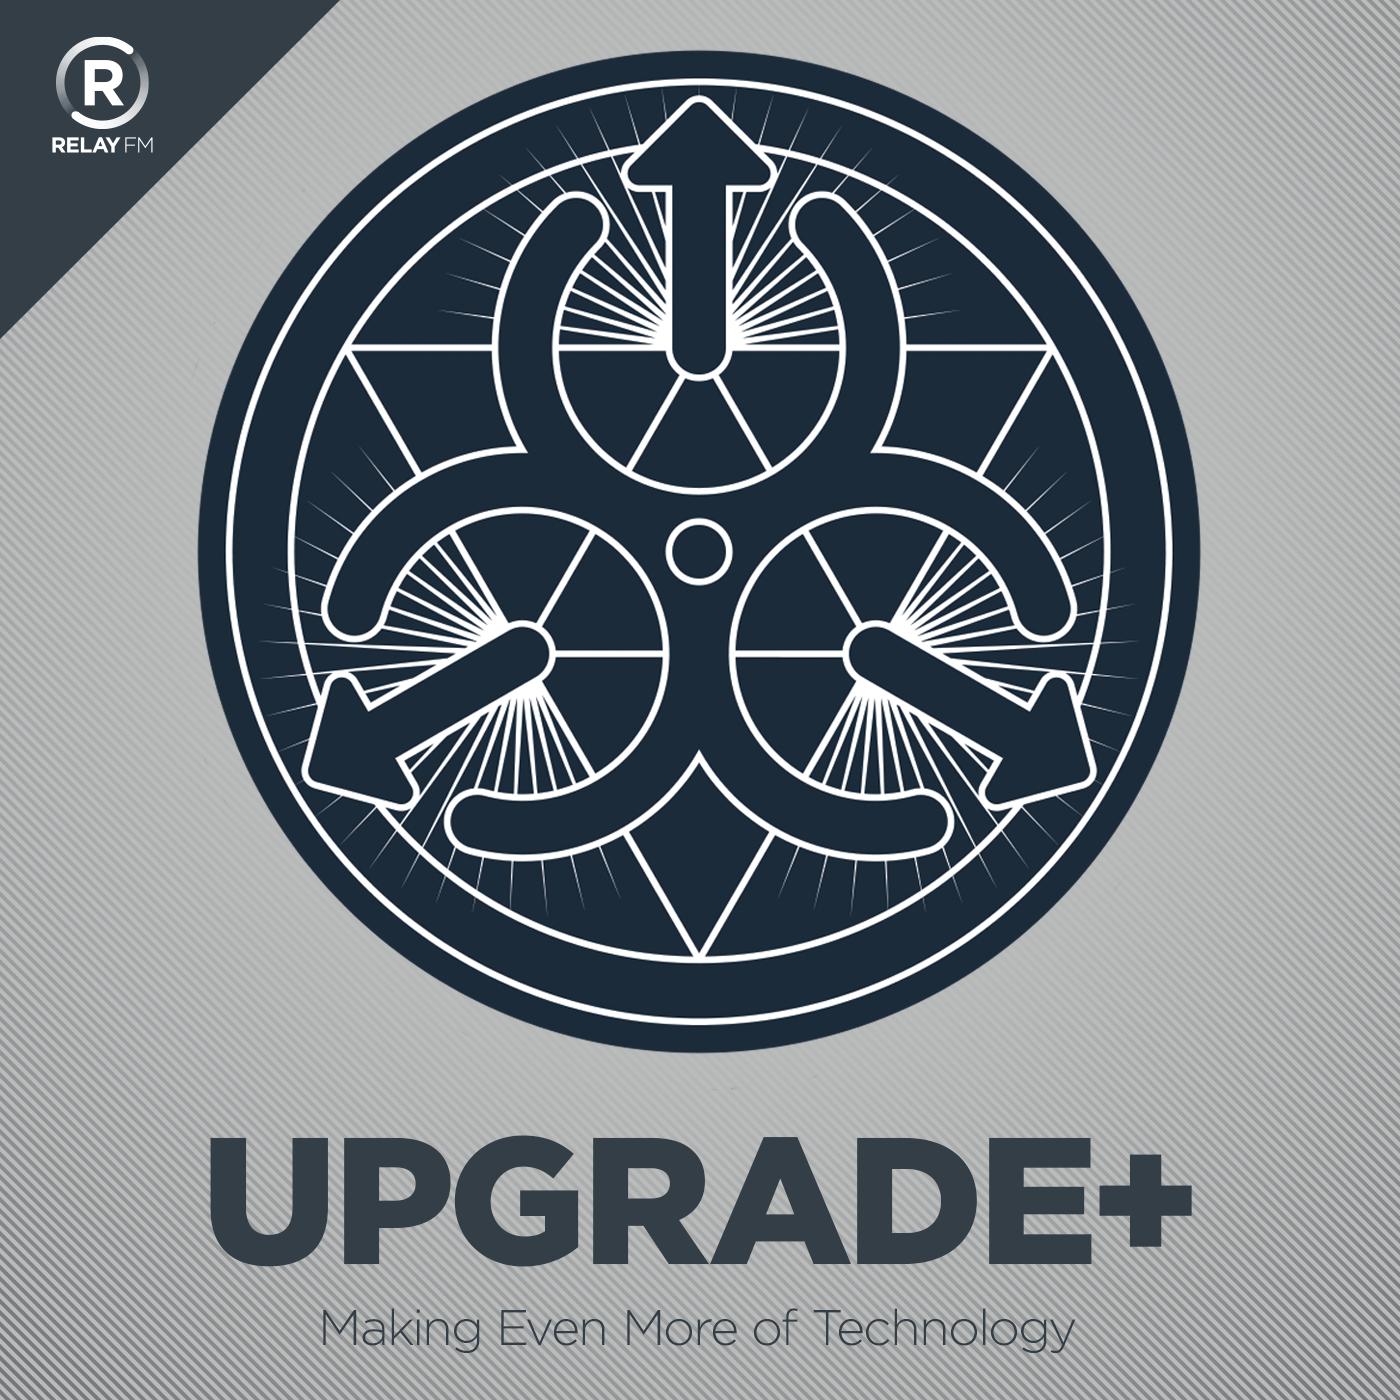 Upgrade artwork